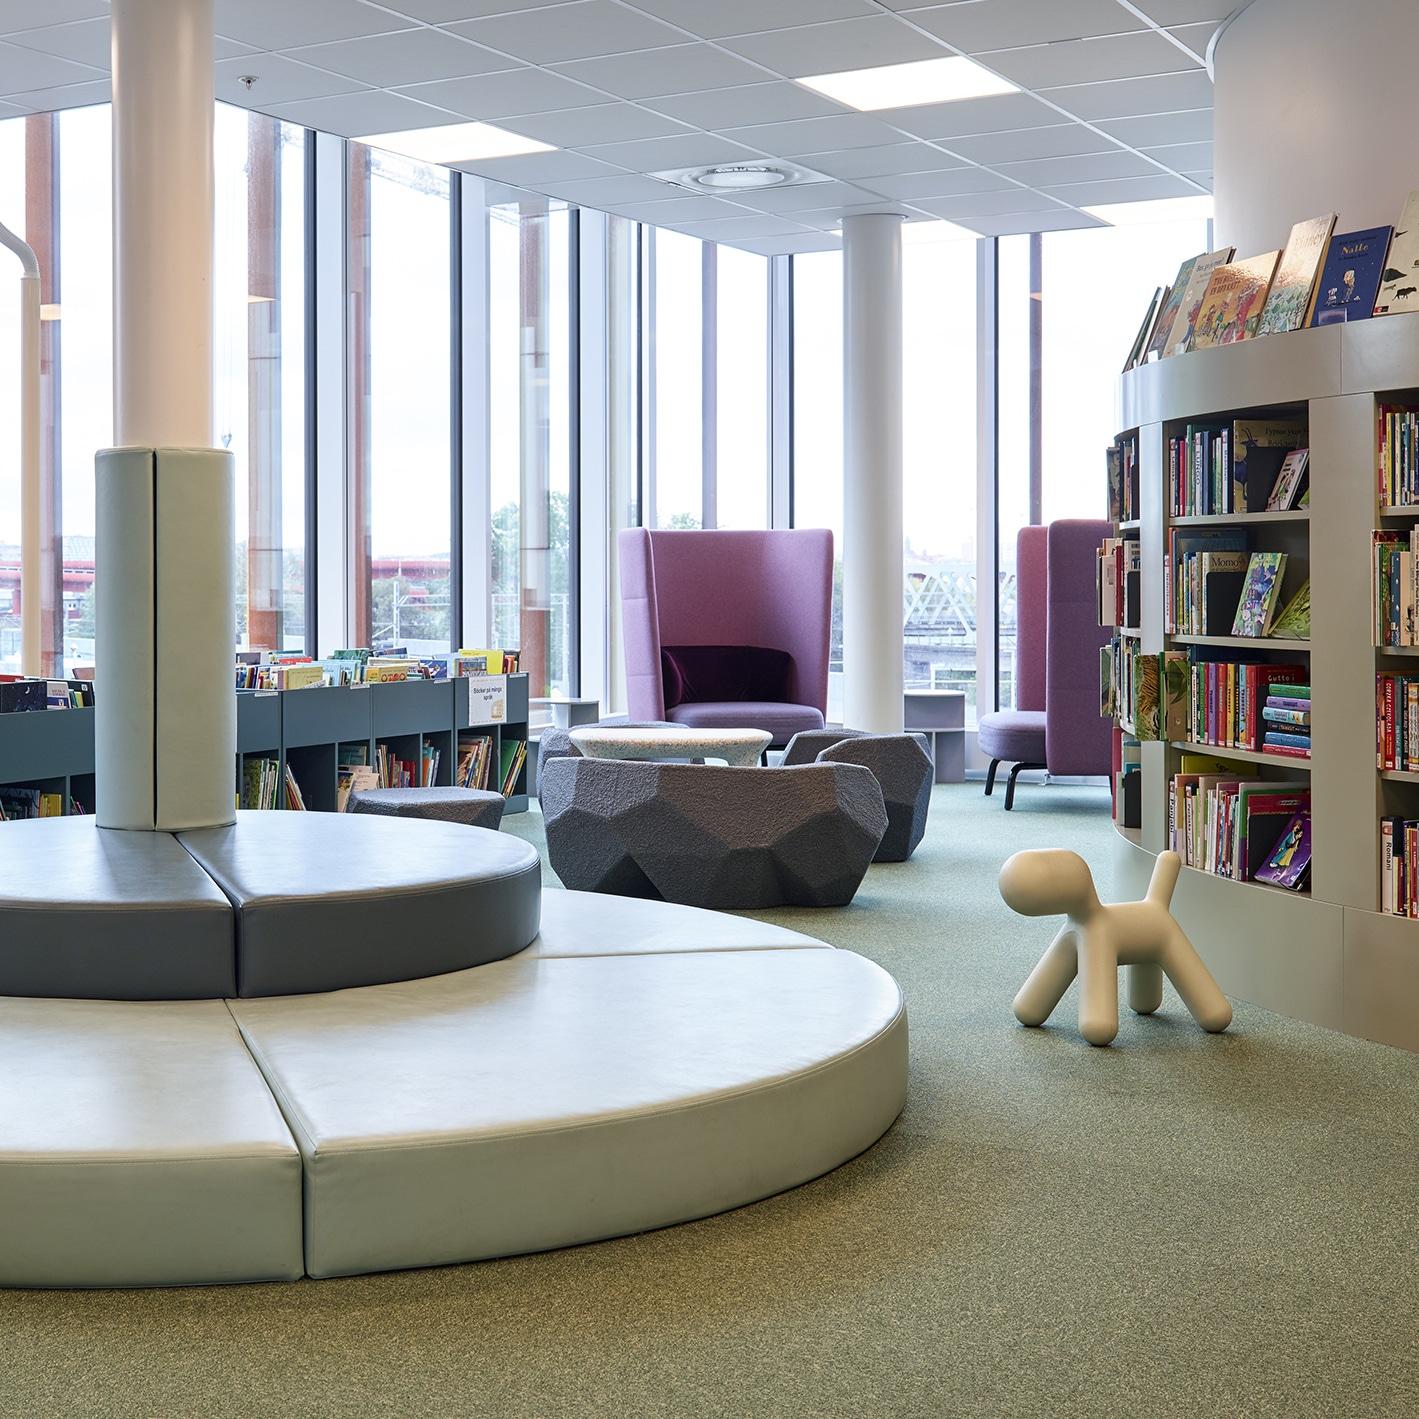 Världslitteraturhuset Library for children and sitting area